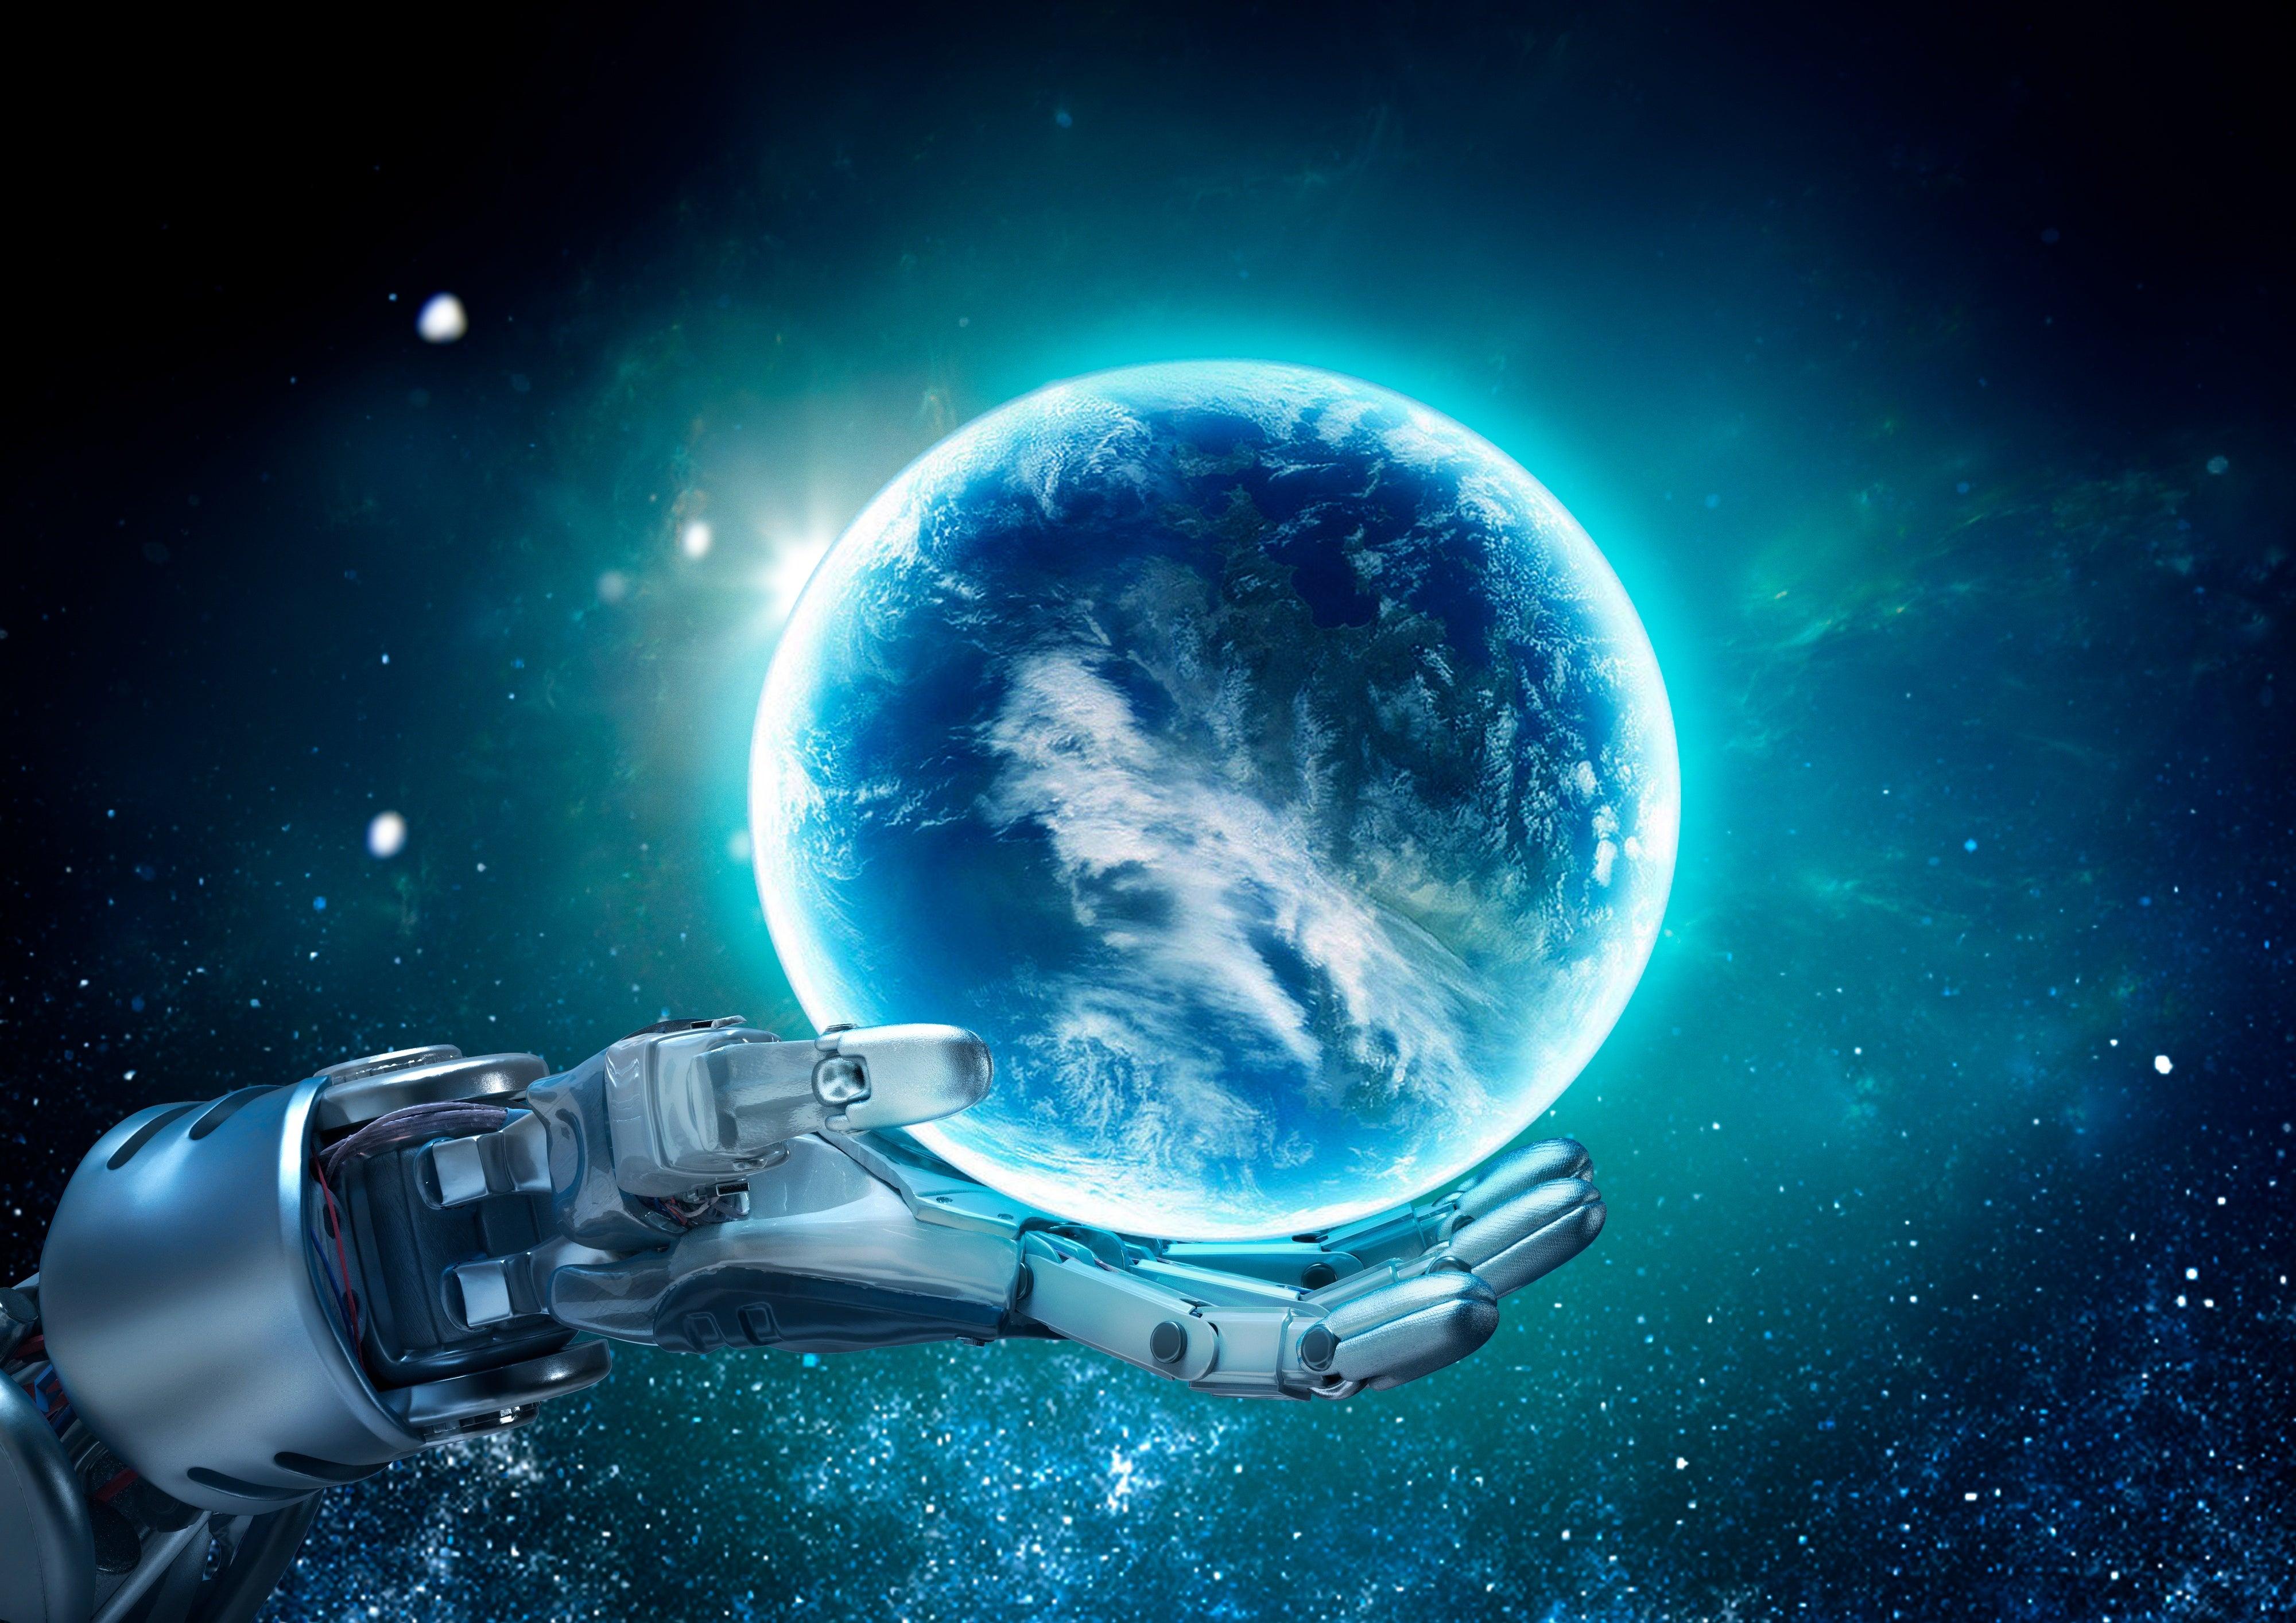 Will Democracy Survive Big Data and Artificial Intelligence? - Scientific  American